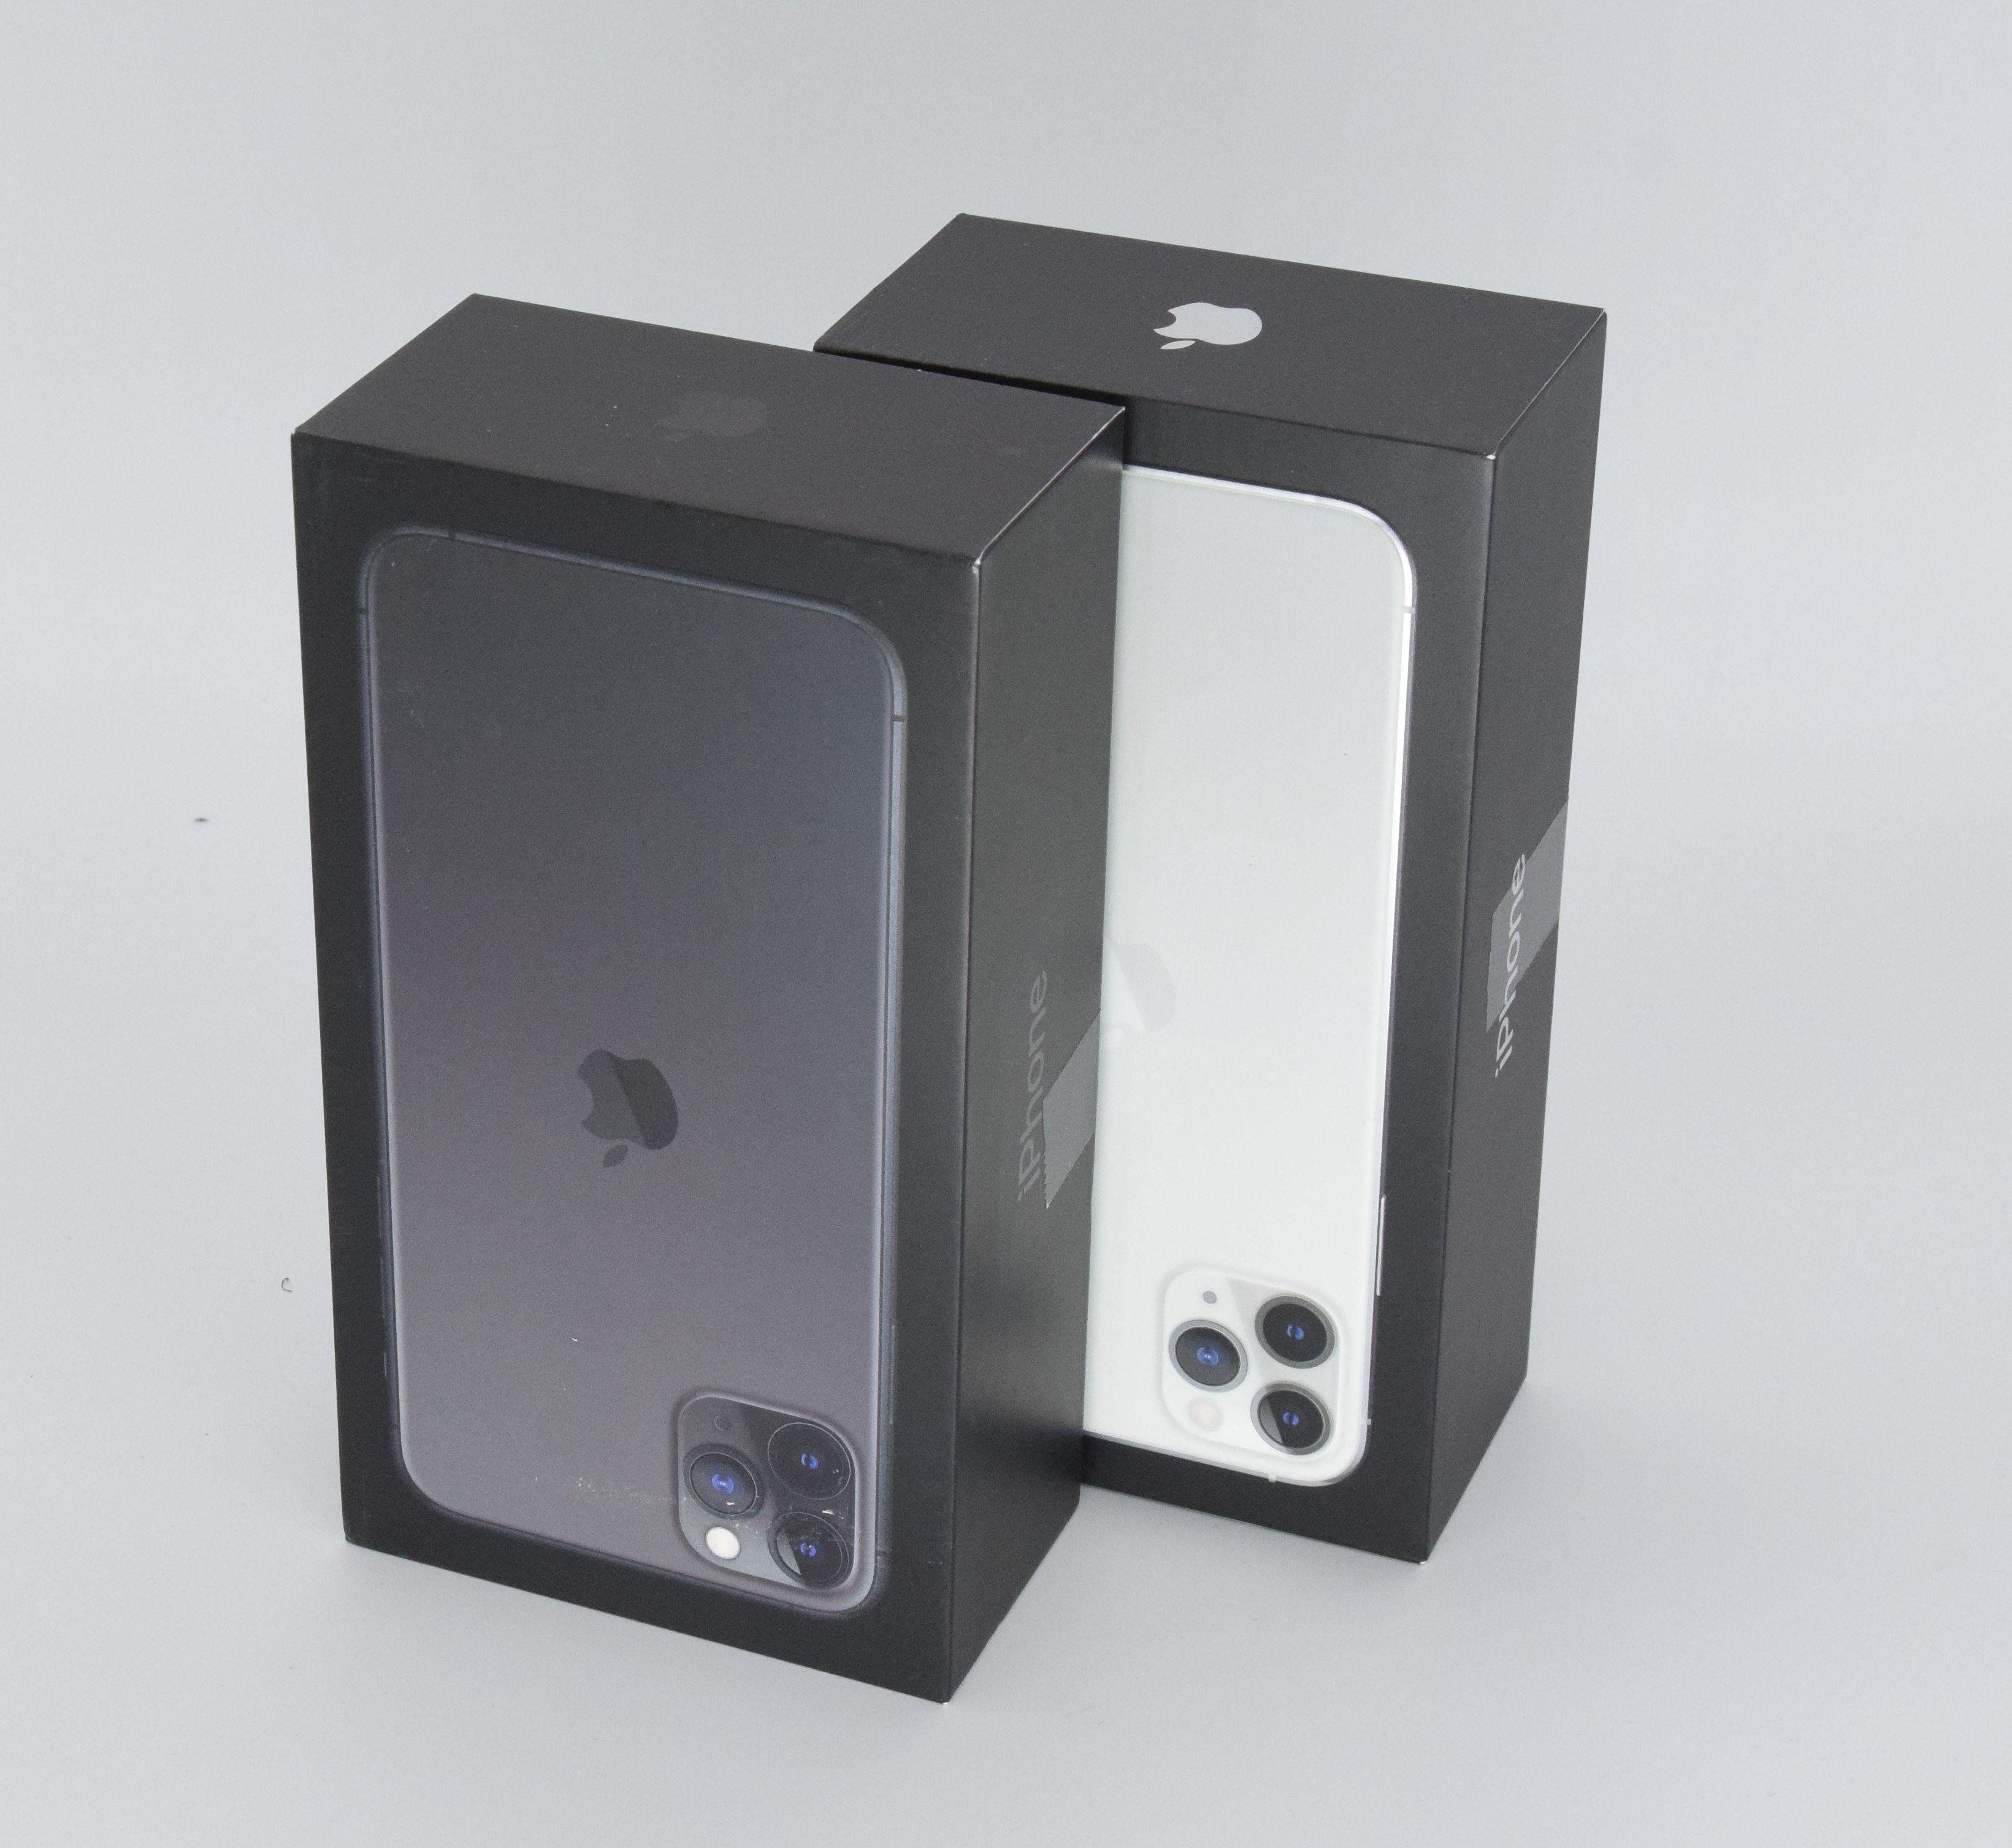 Apple Iphone 11 pro MAX 64 GB Space Gray. DHL Rechnung 19% MWST **Wie Neu**